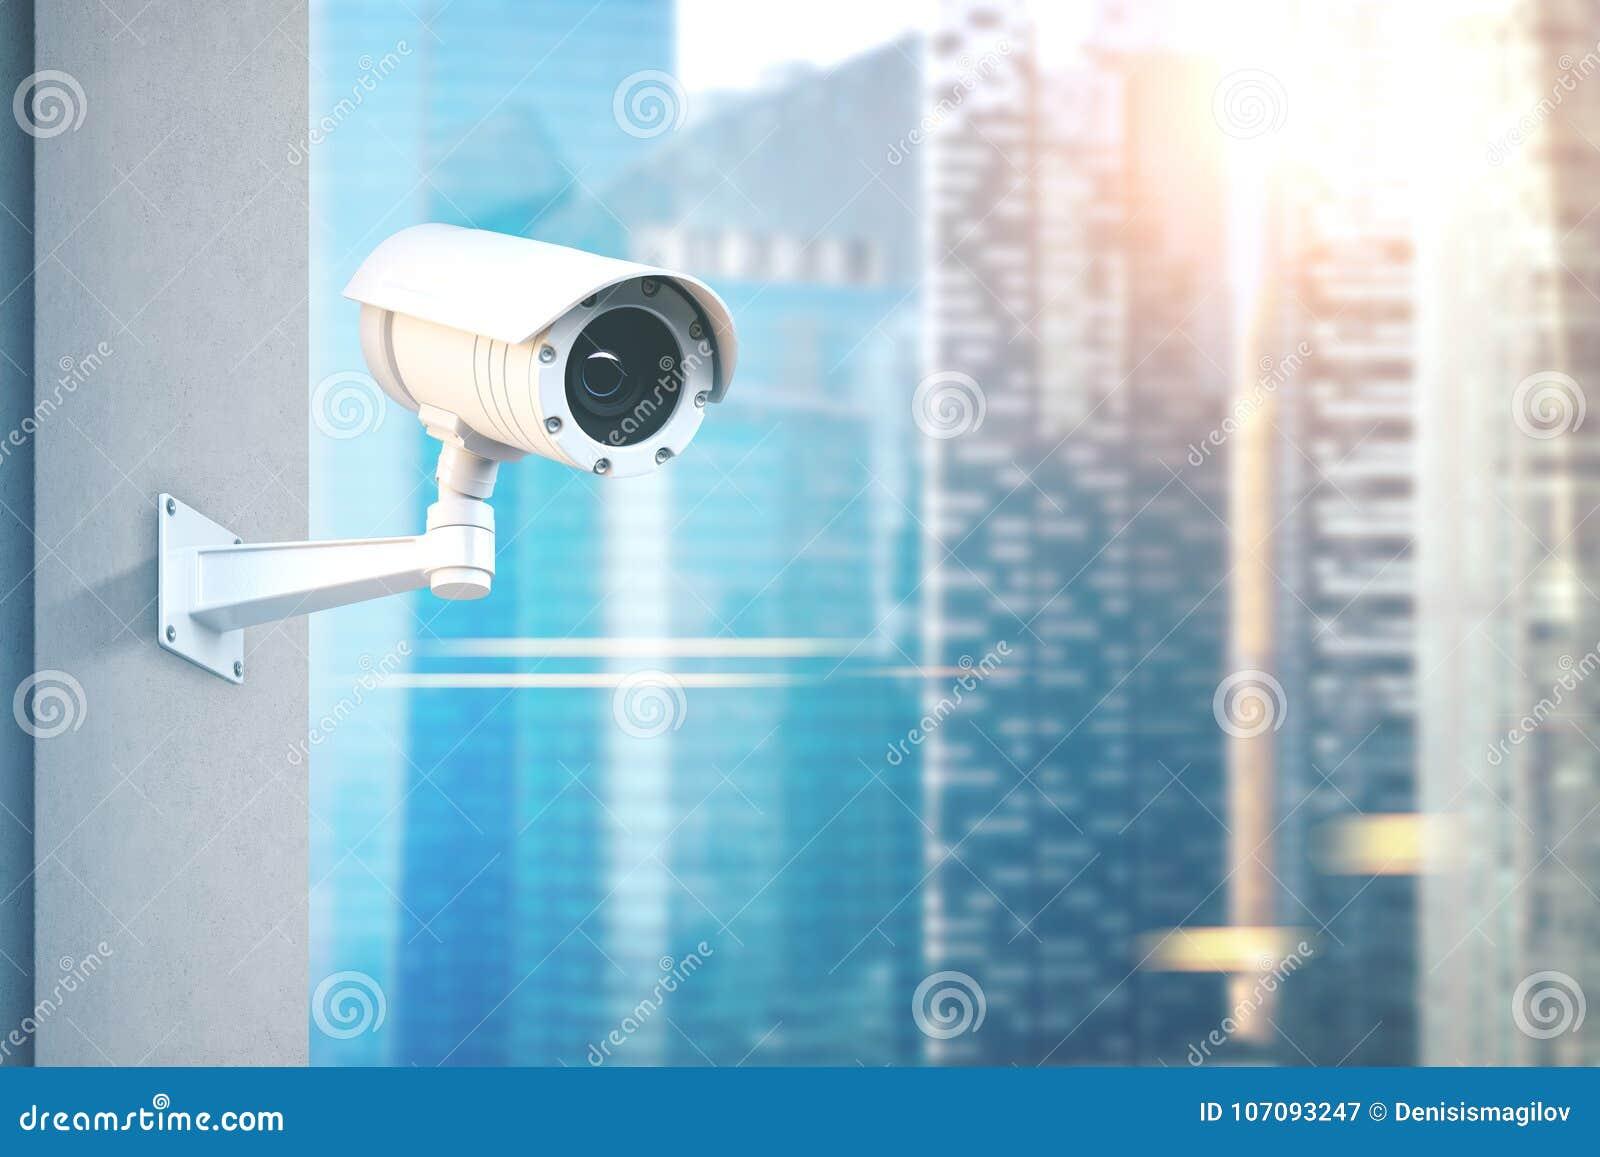 Cctv-kamera, suddig stad